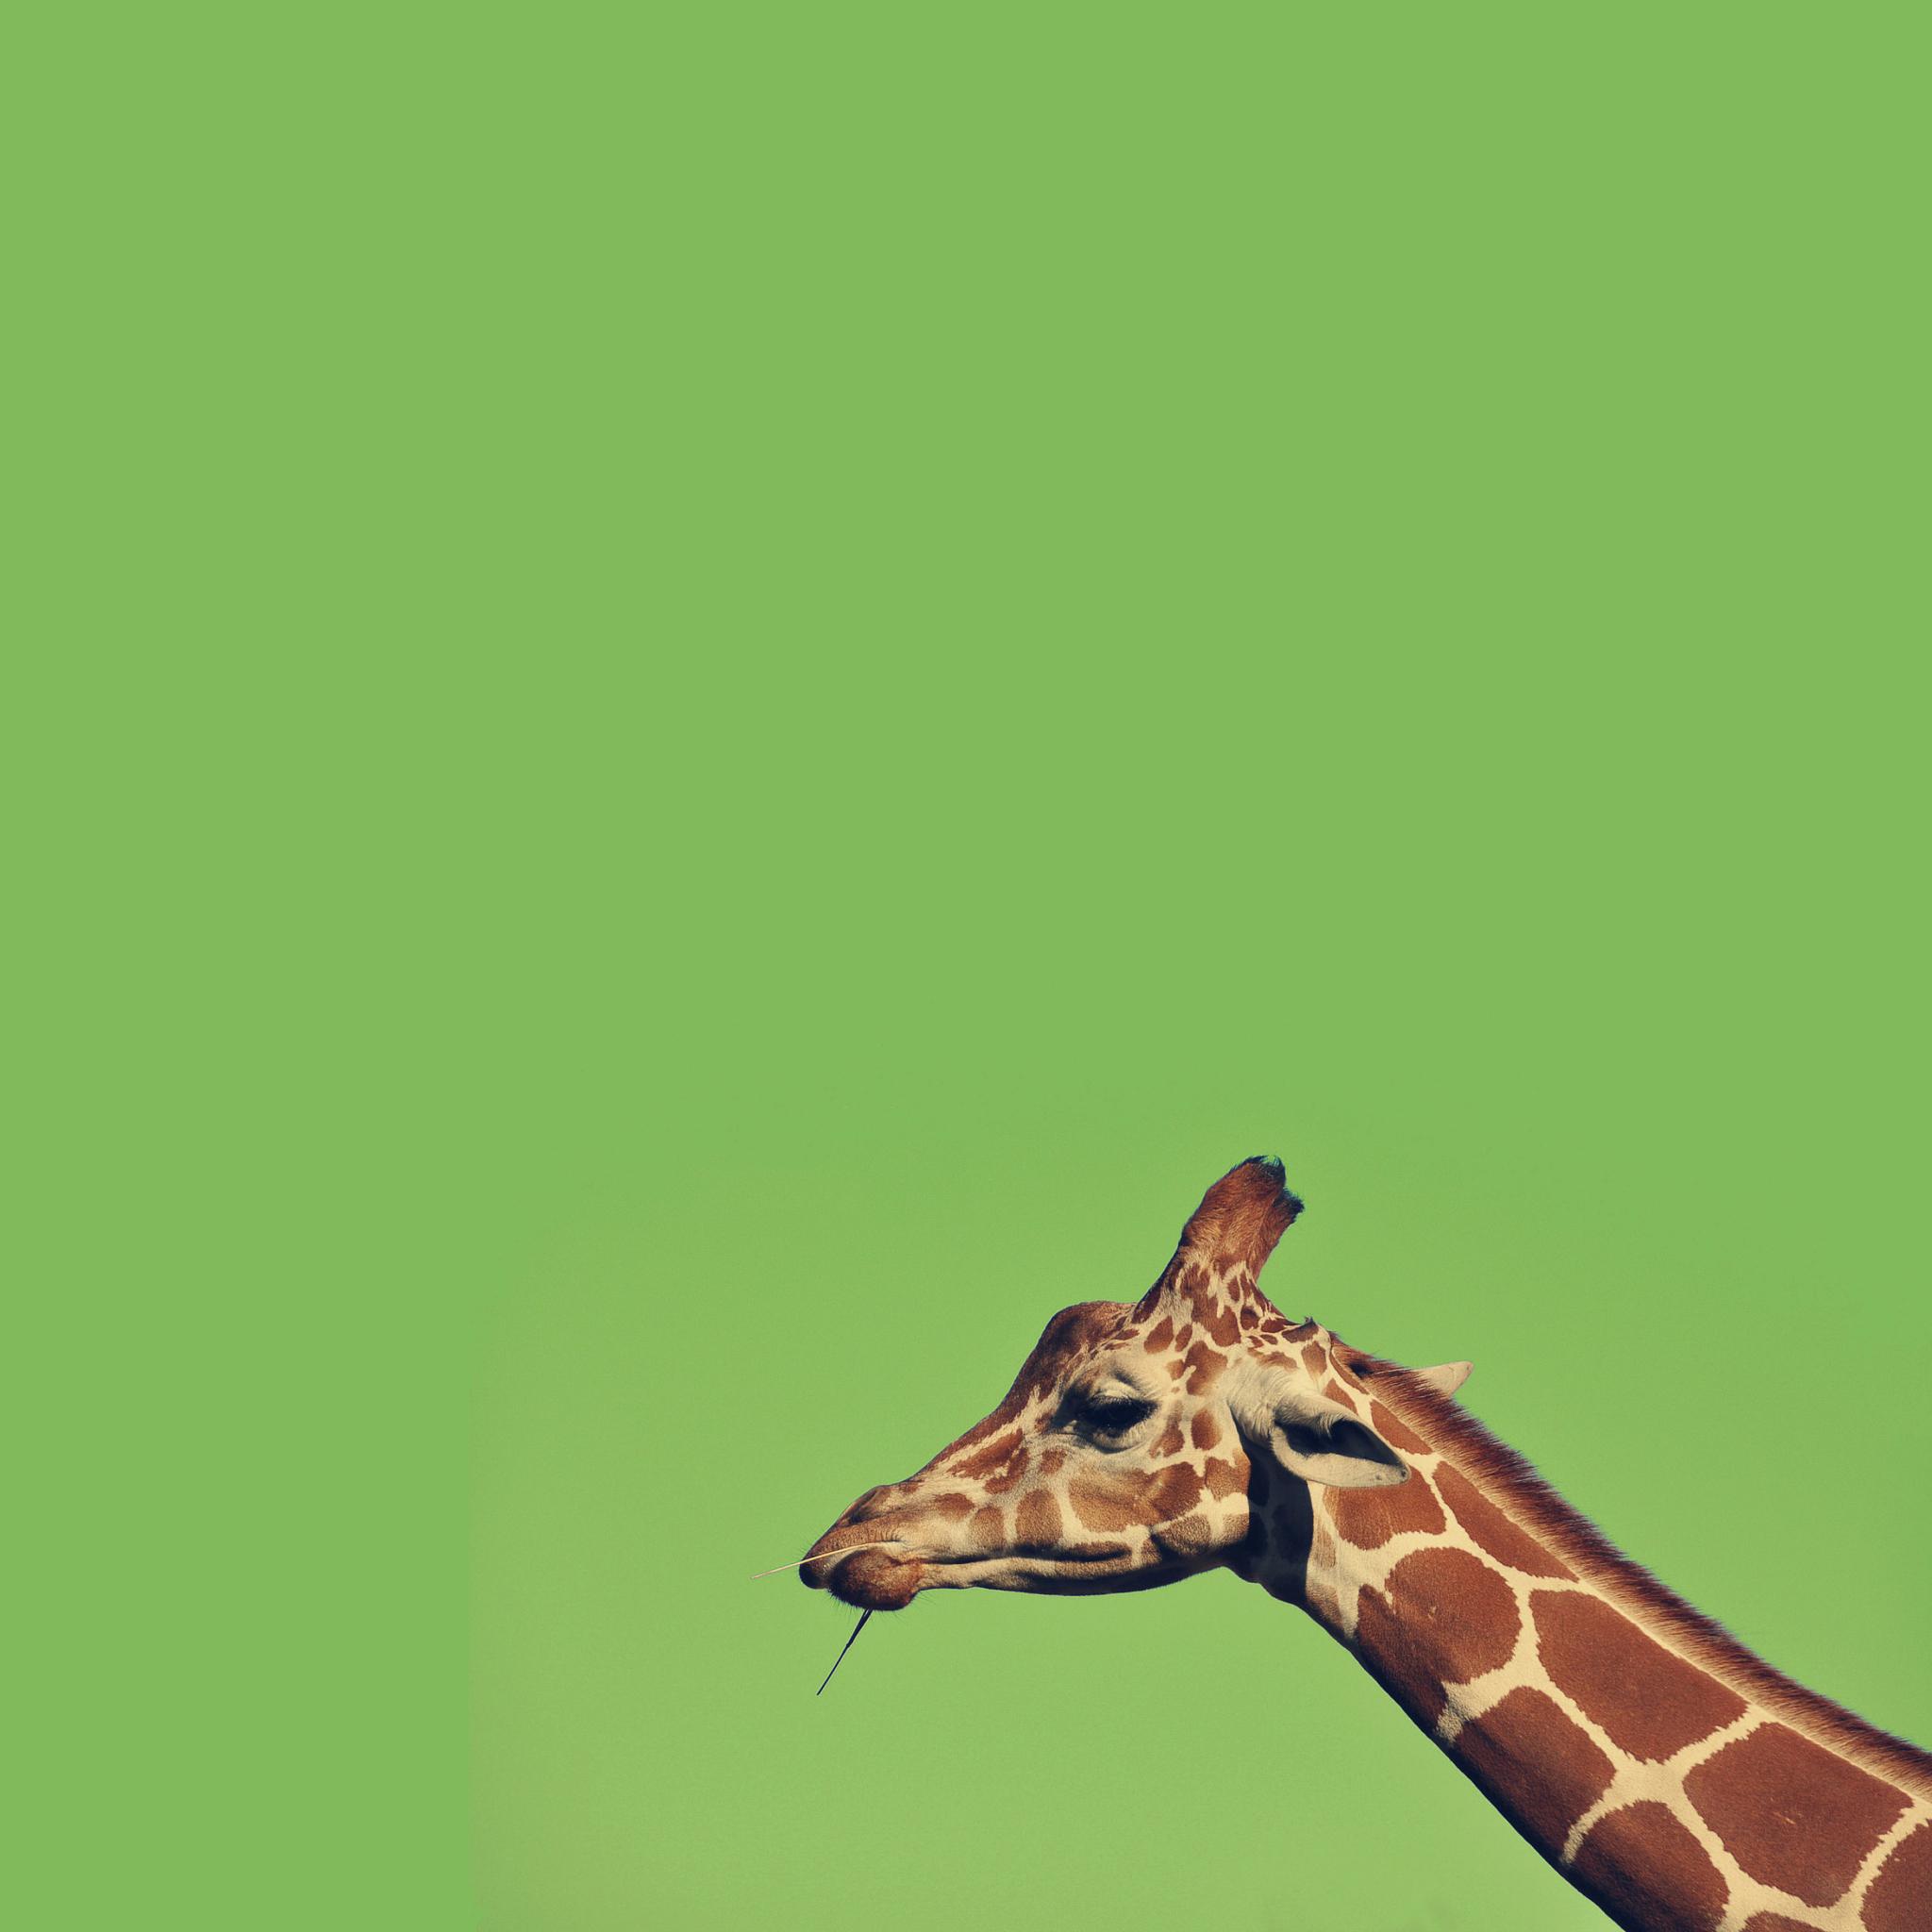 жираф рисунок  № 3522602 бесплатно